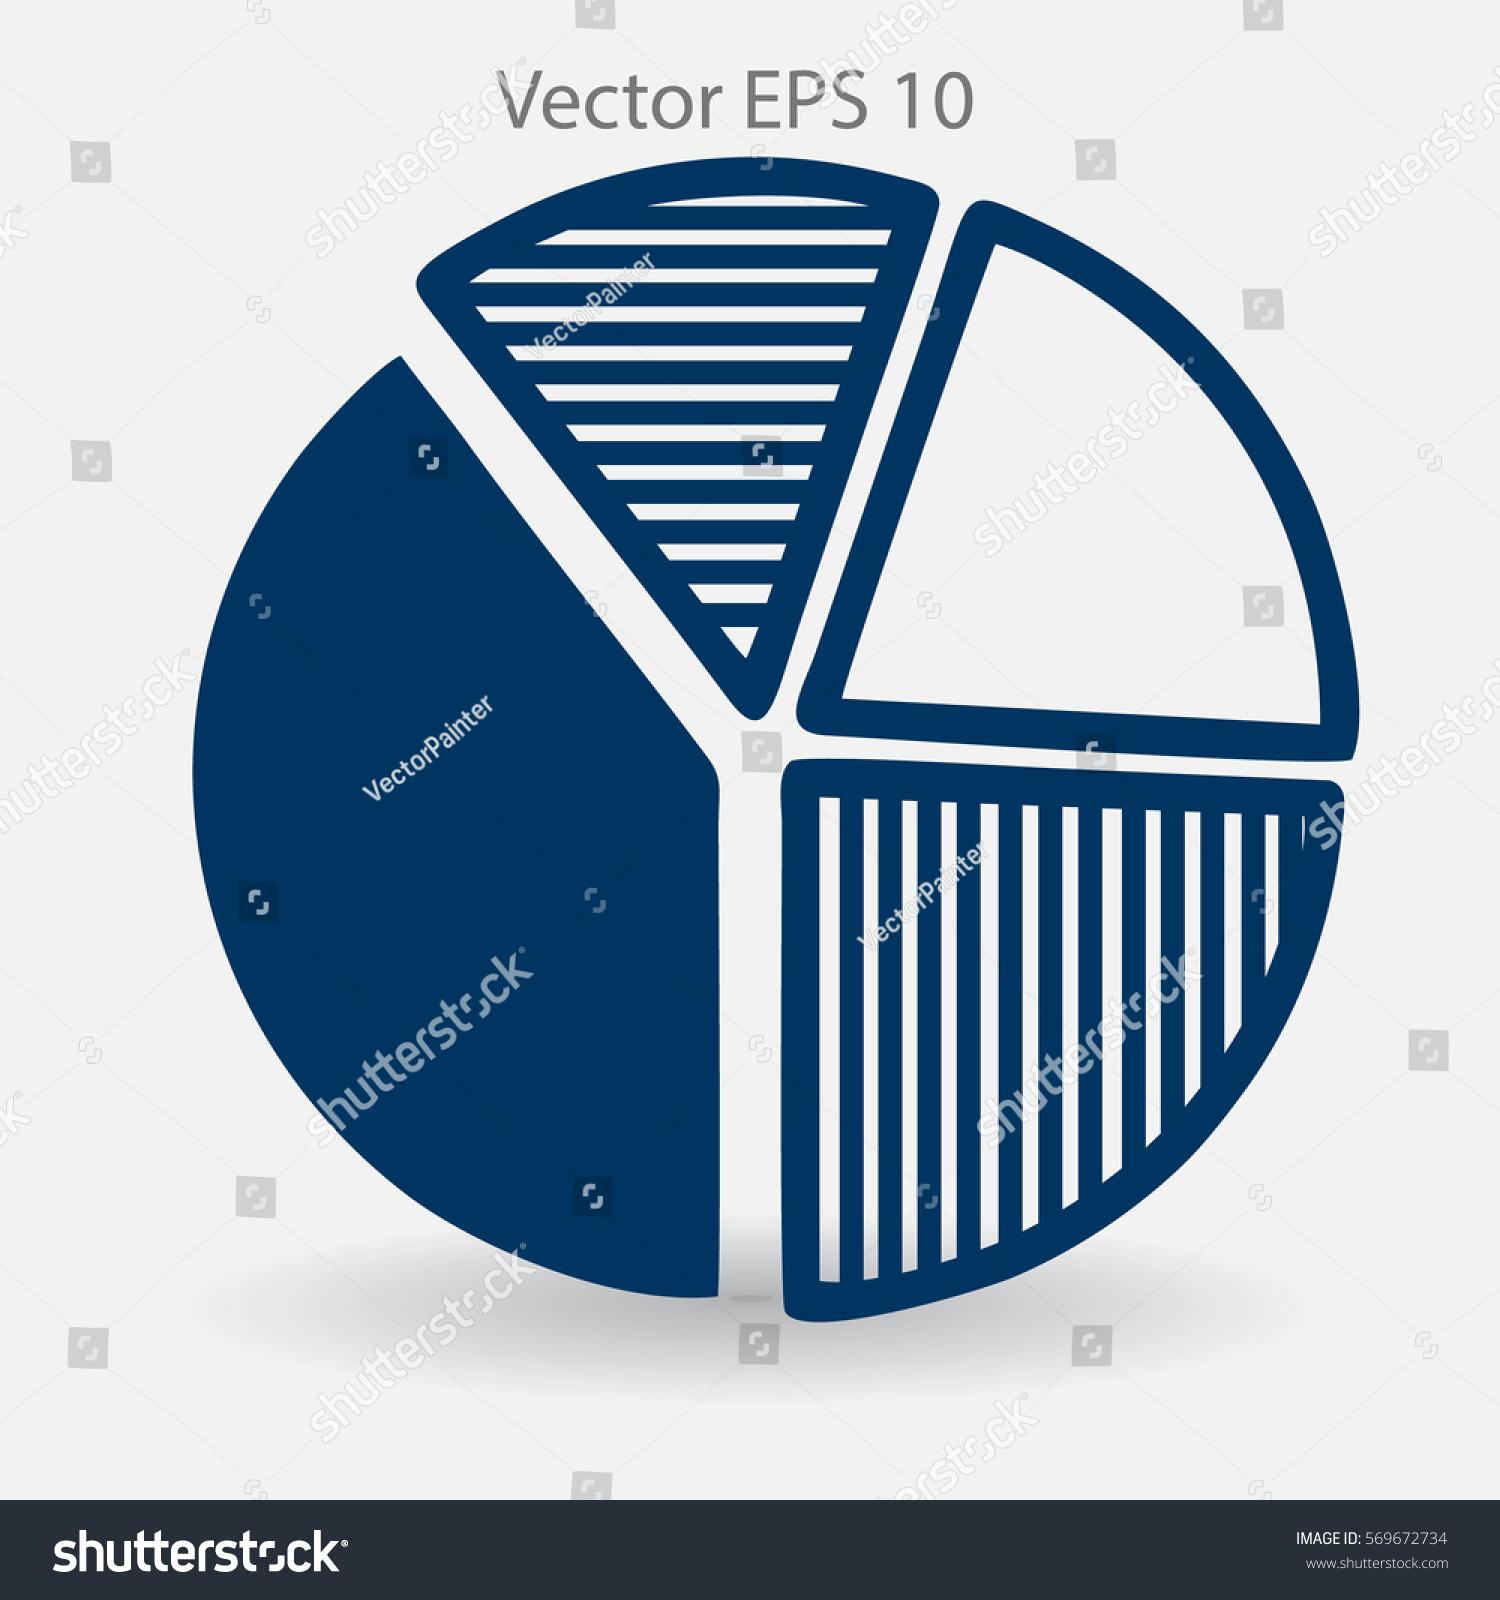 Diagram Visual Aid Vector Illustration Stock Vector 569672734 ...